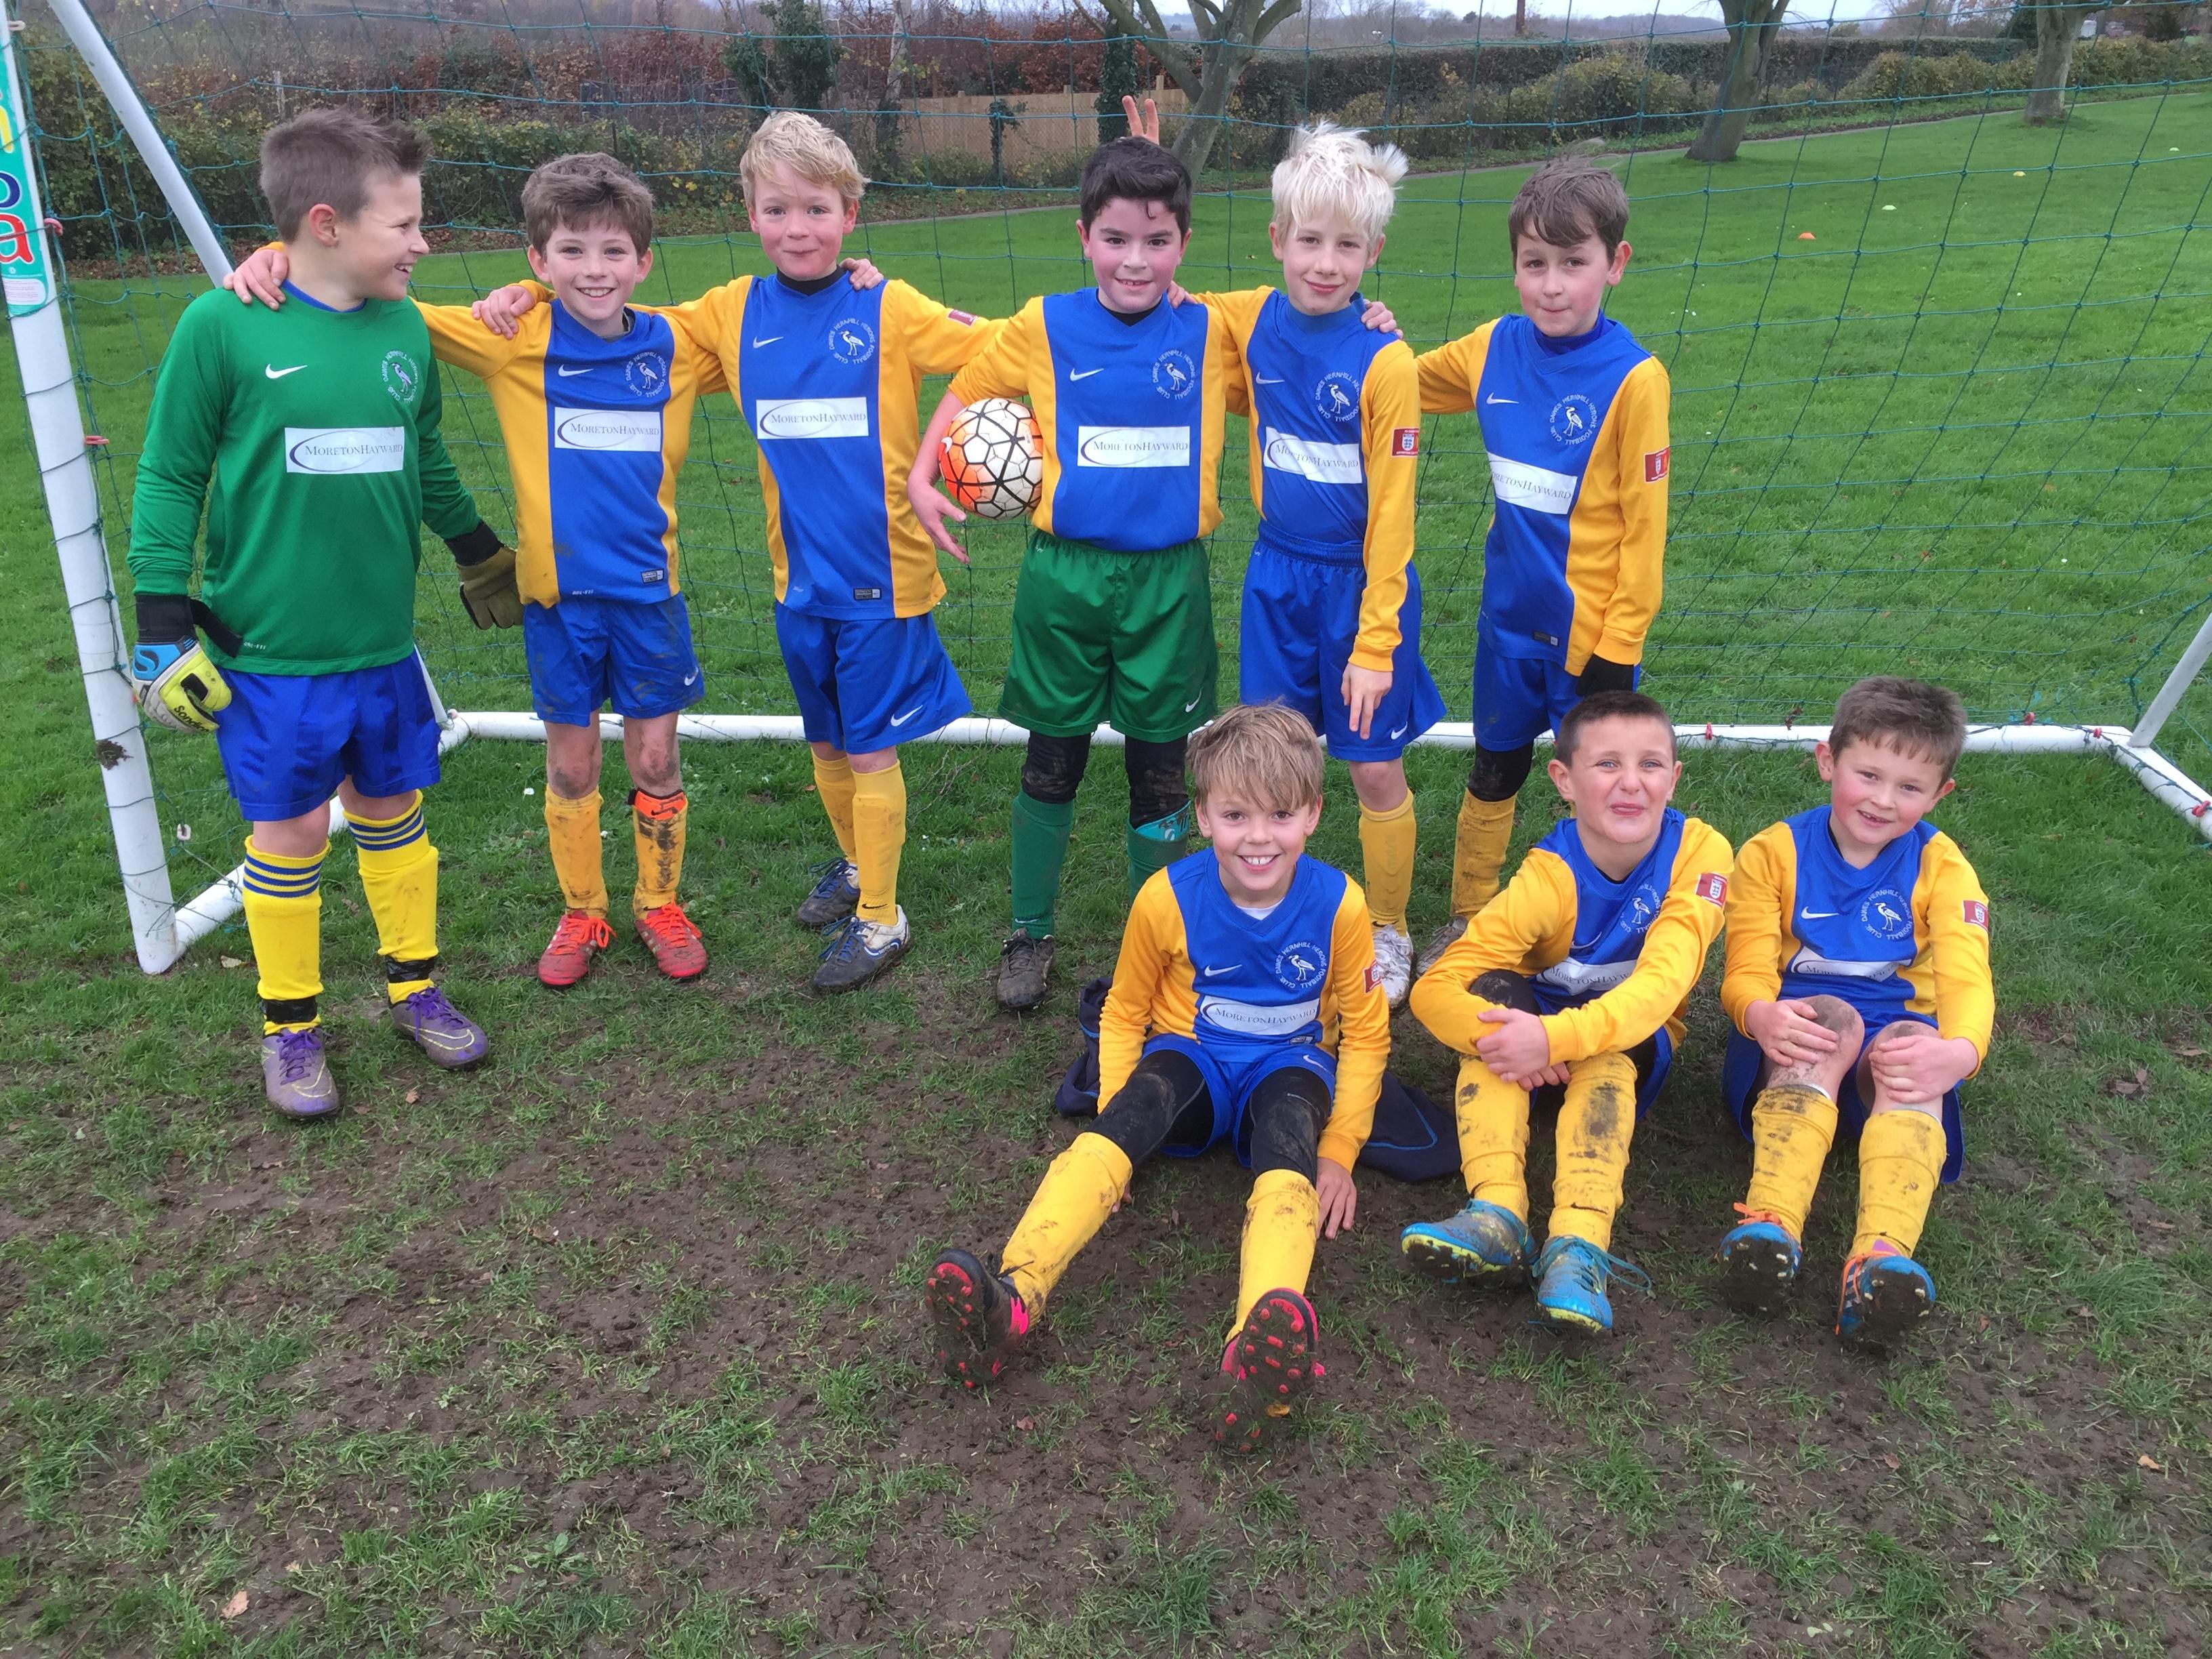 Moreton Hayward proudly sponsor the Dawes Hernhill Herons Junior Football Club